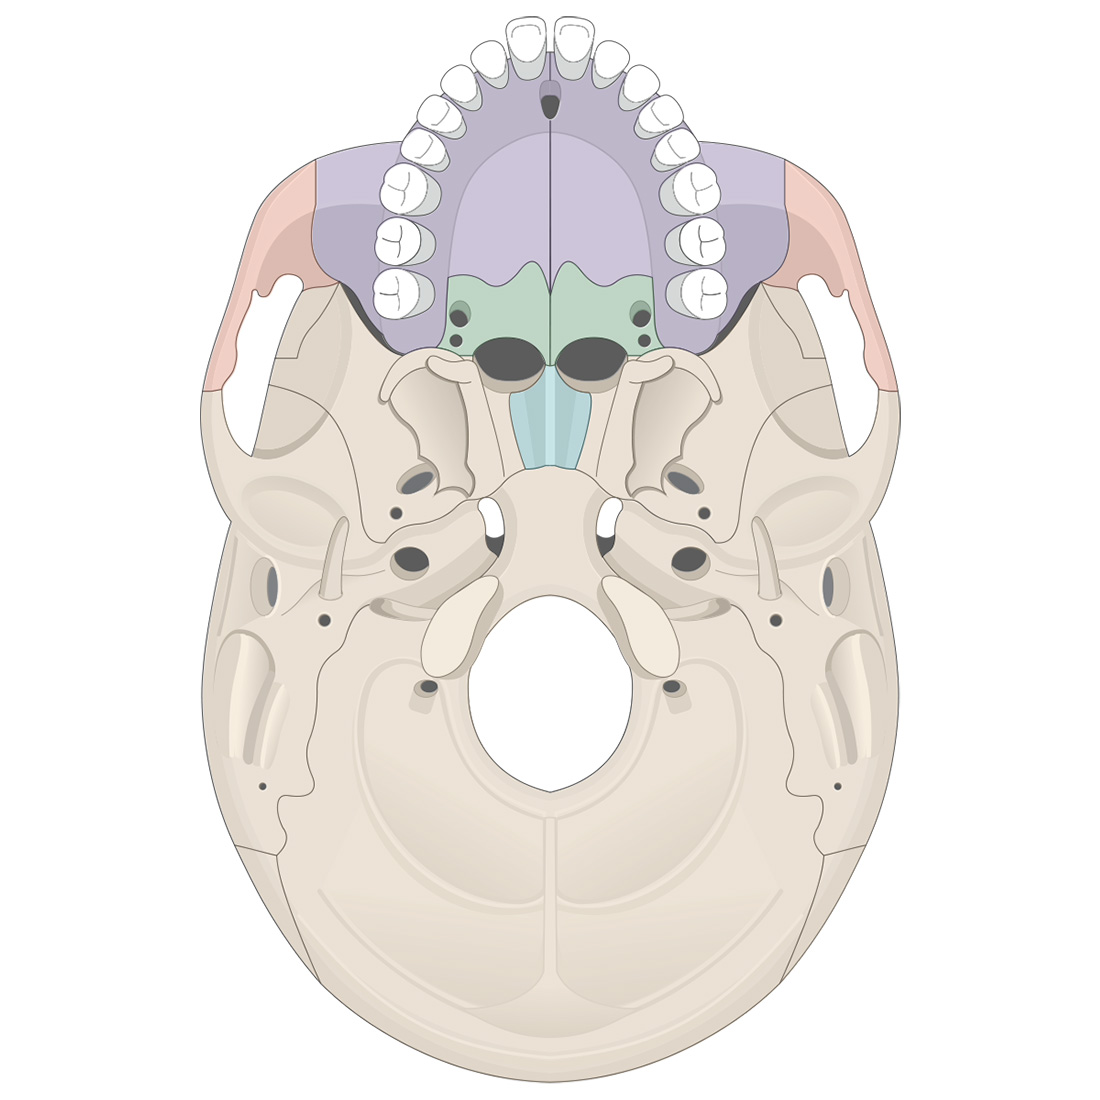 Facial bones: inferior view of the skull